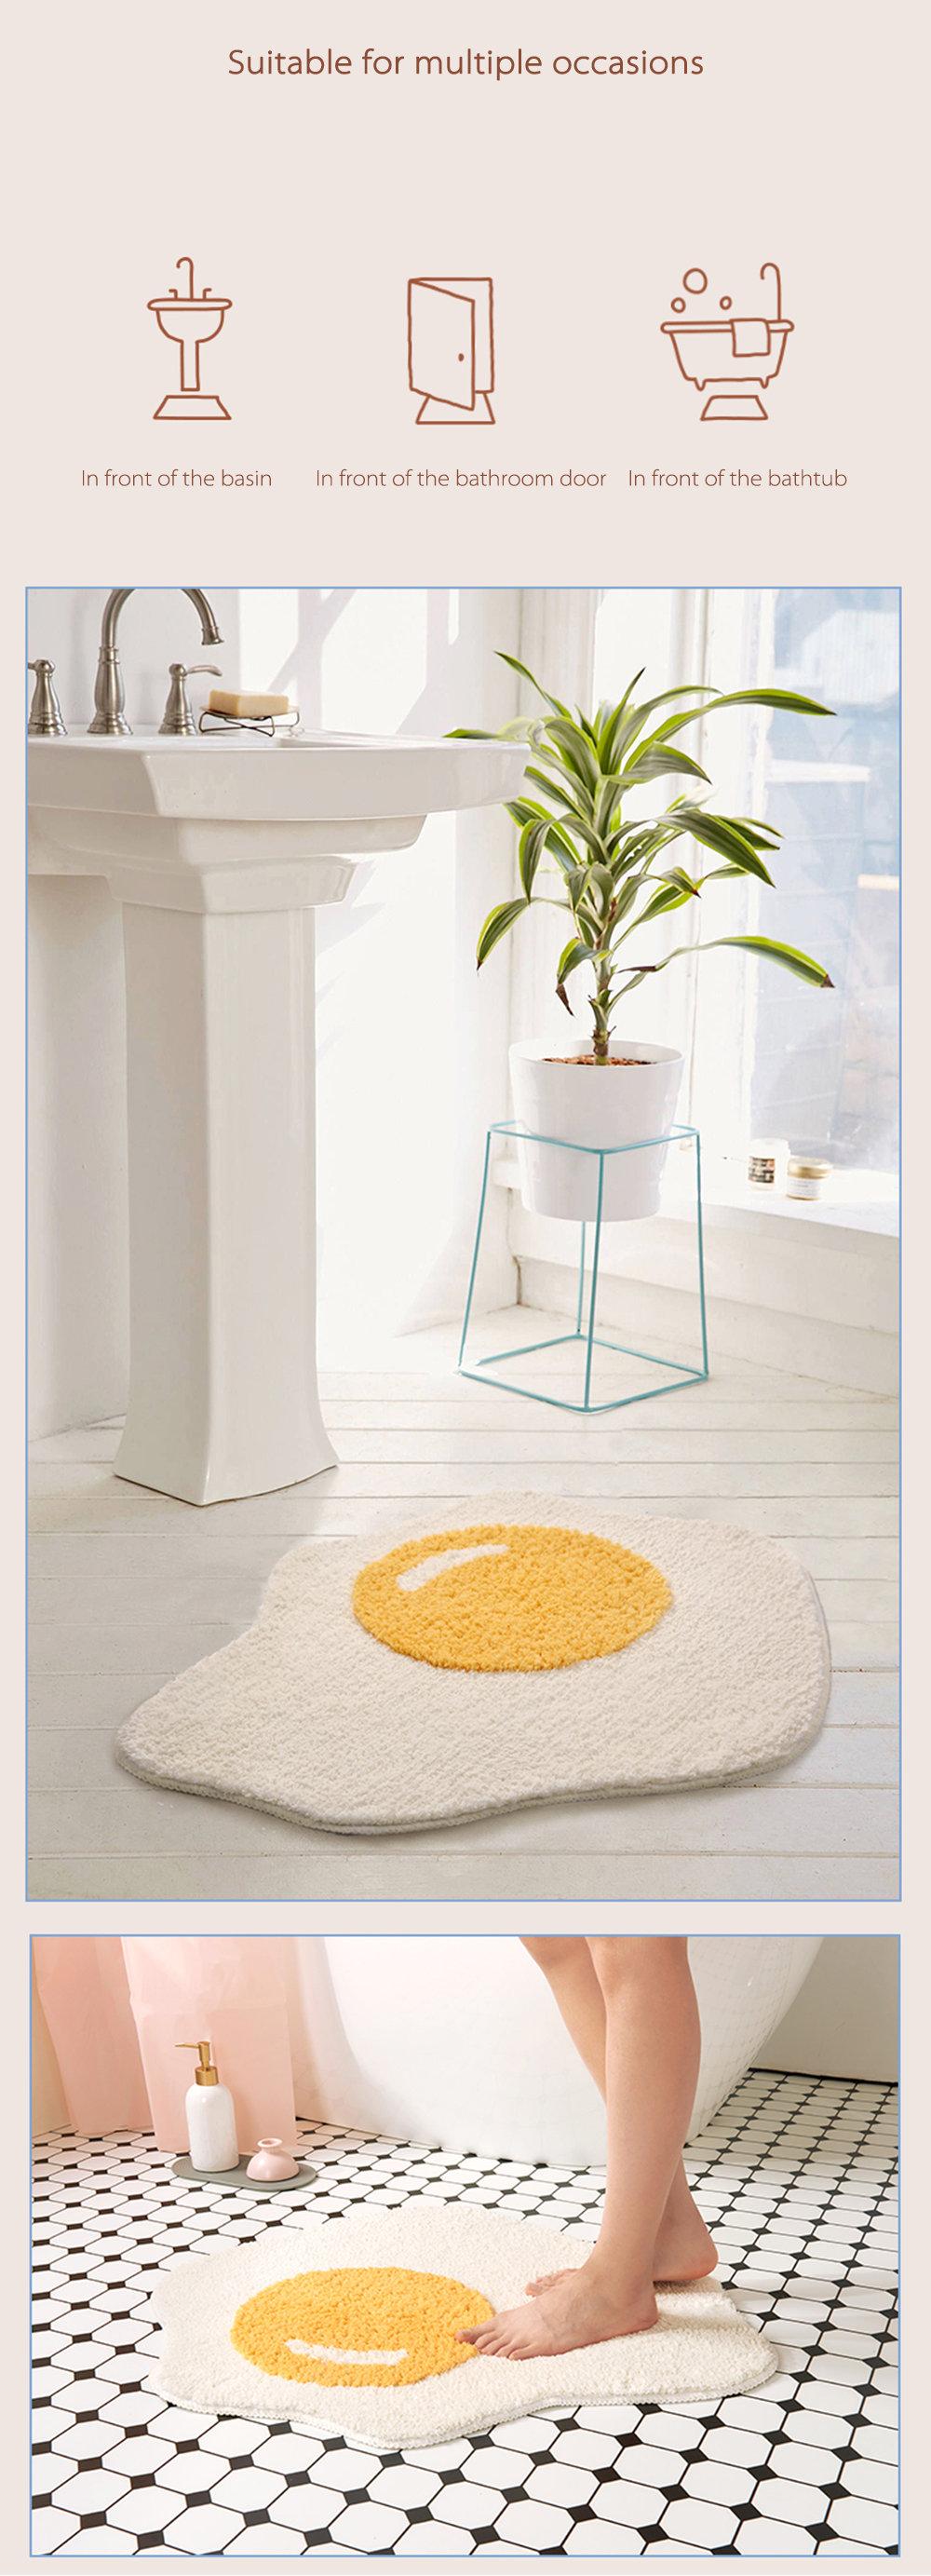 Poached Egg Floor Mat Creative and Unique